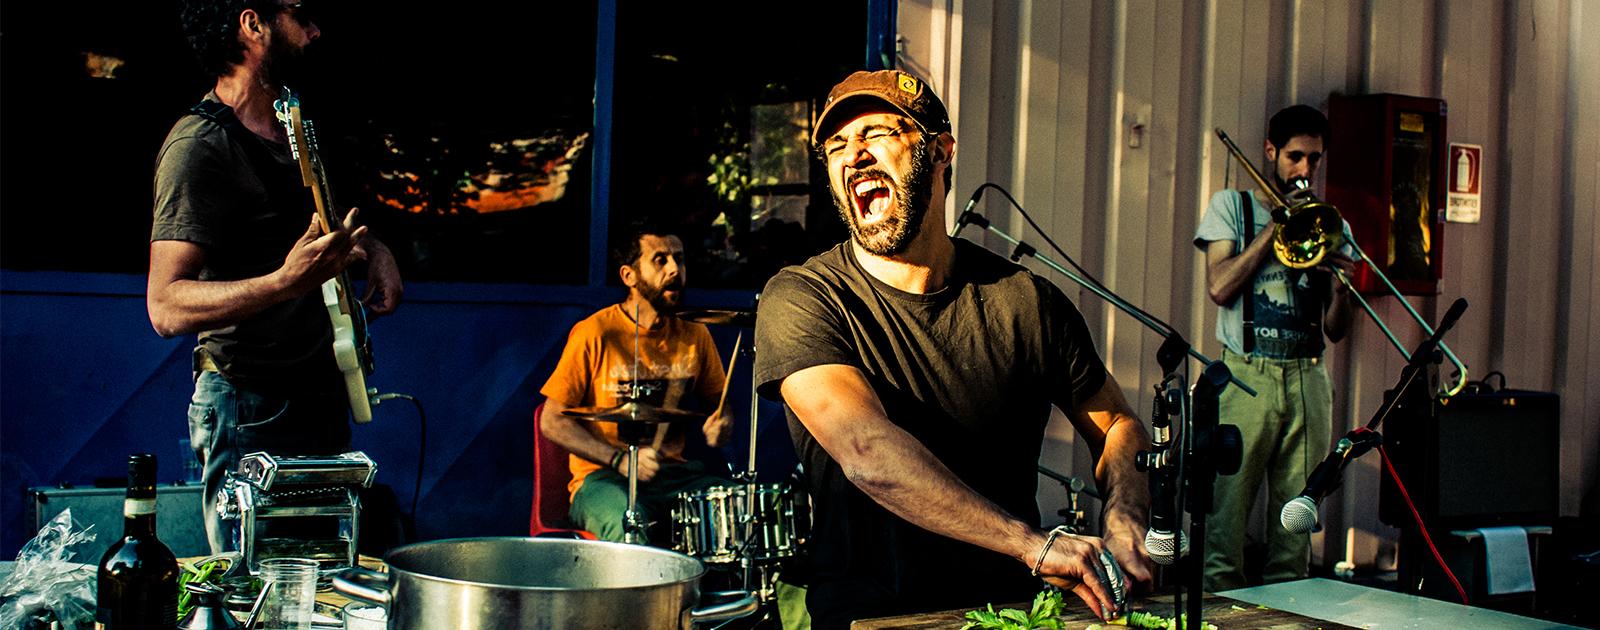 Don Pasta Food Sound System  – COOKING DJ SET